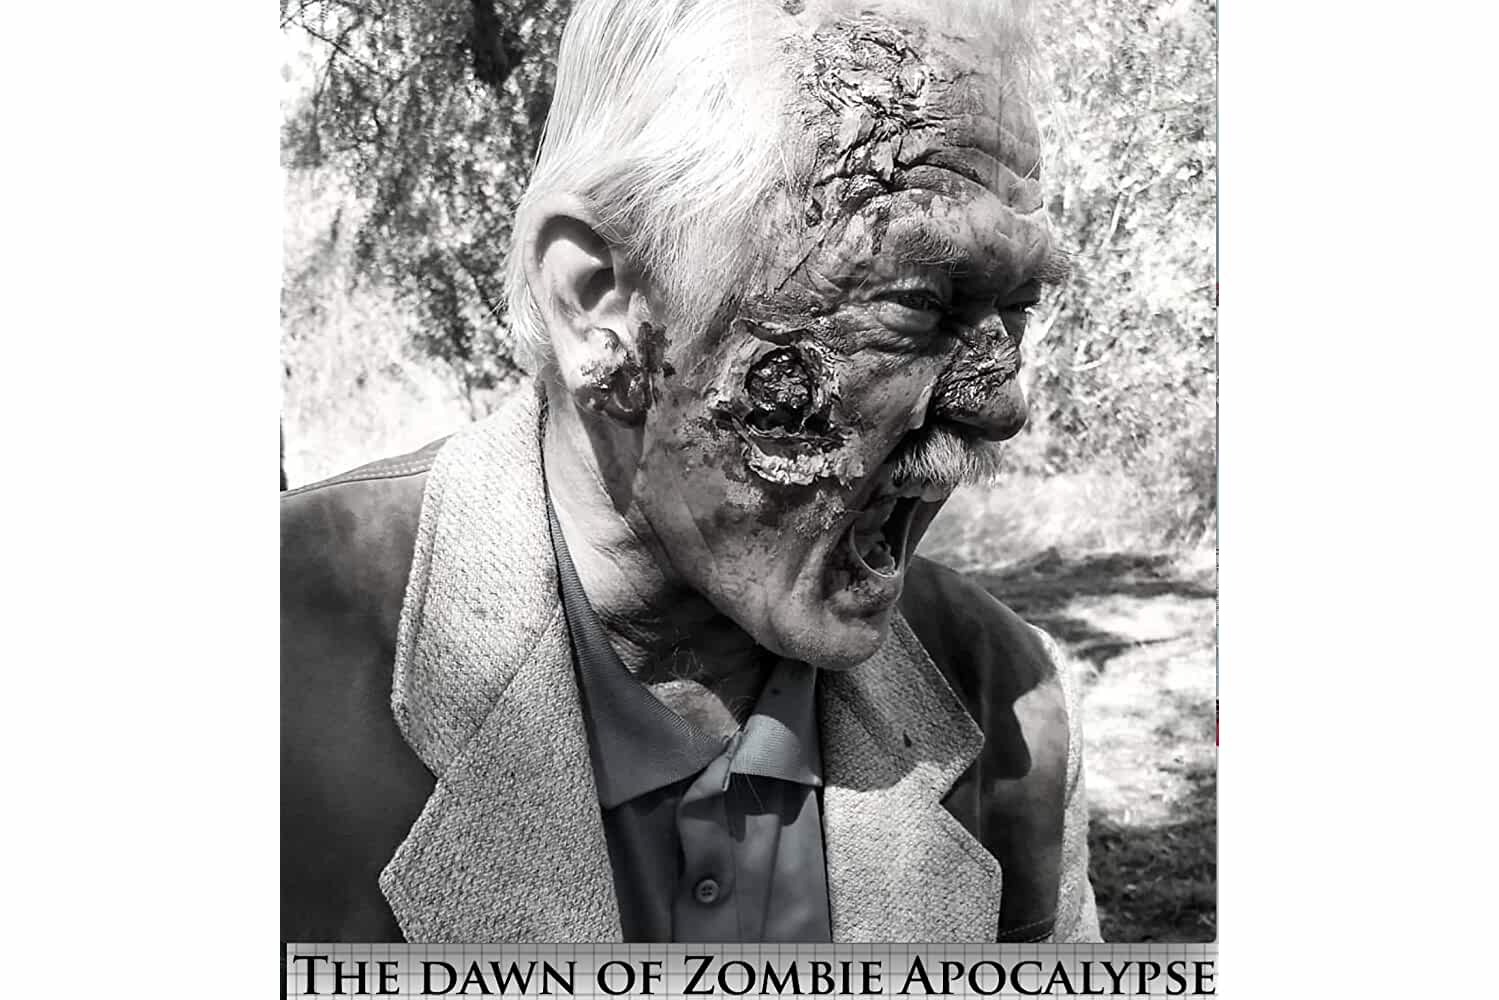 The Dawn of Zombie Apocalypse (2018)